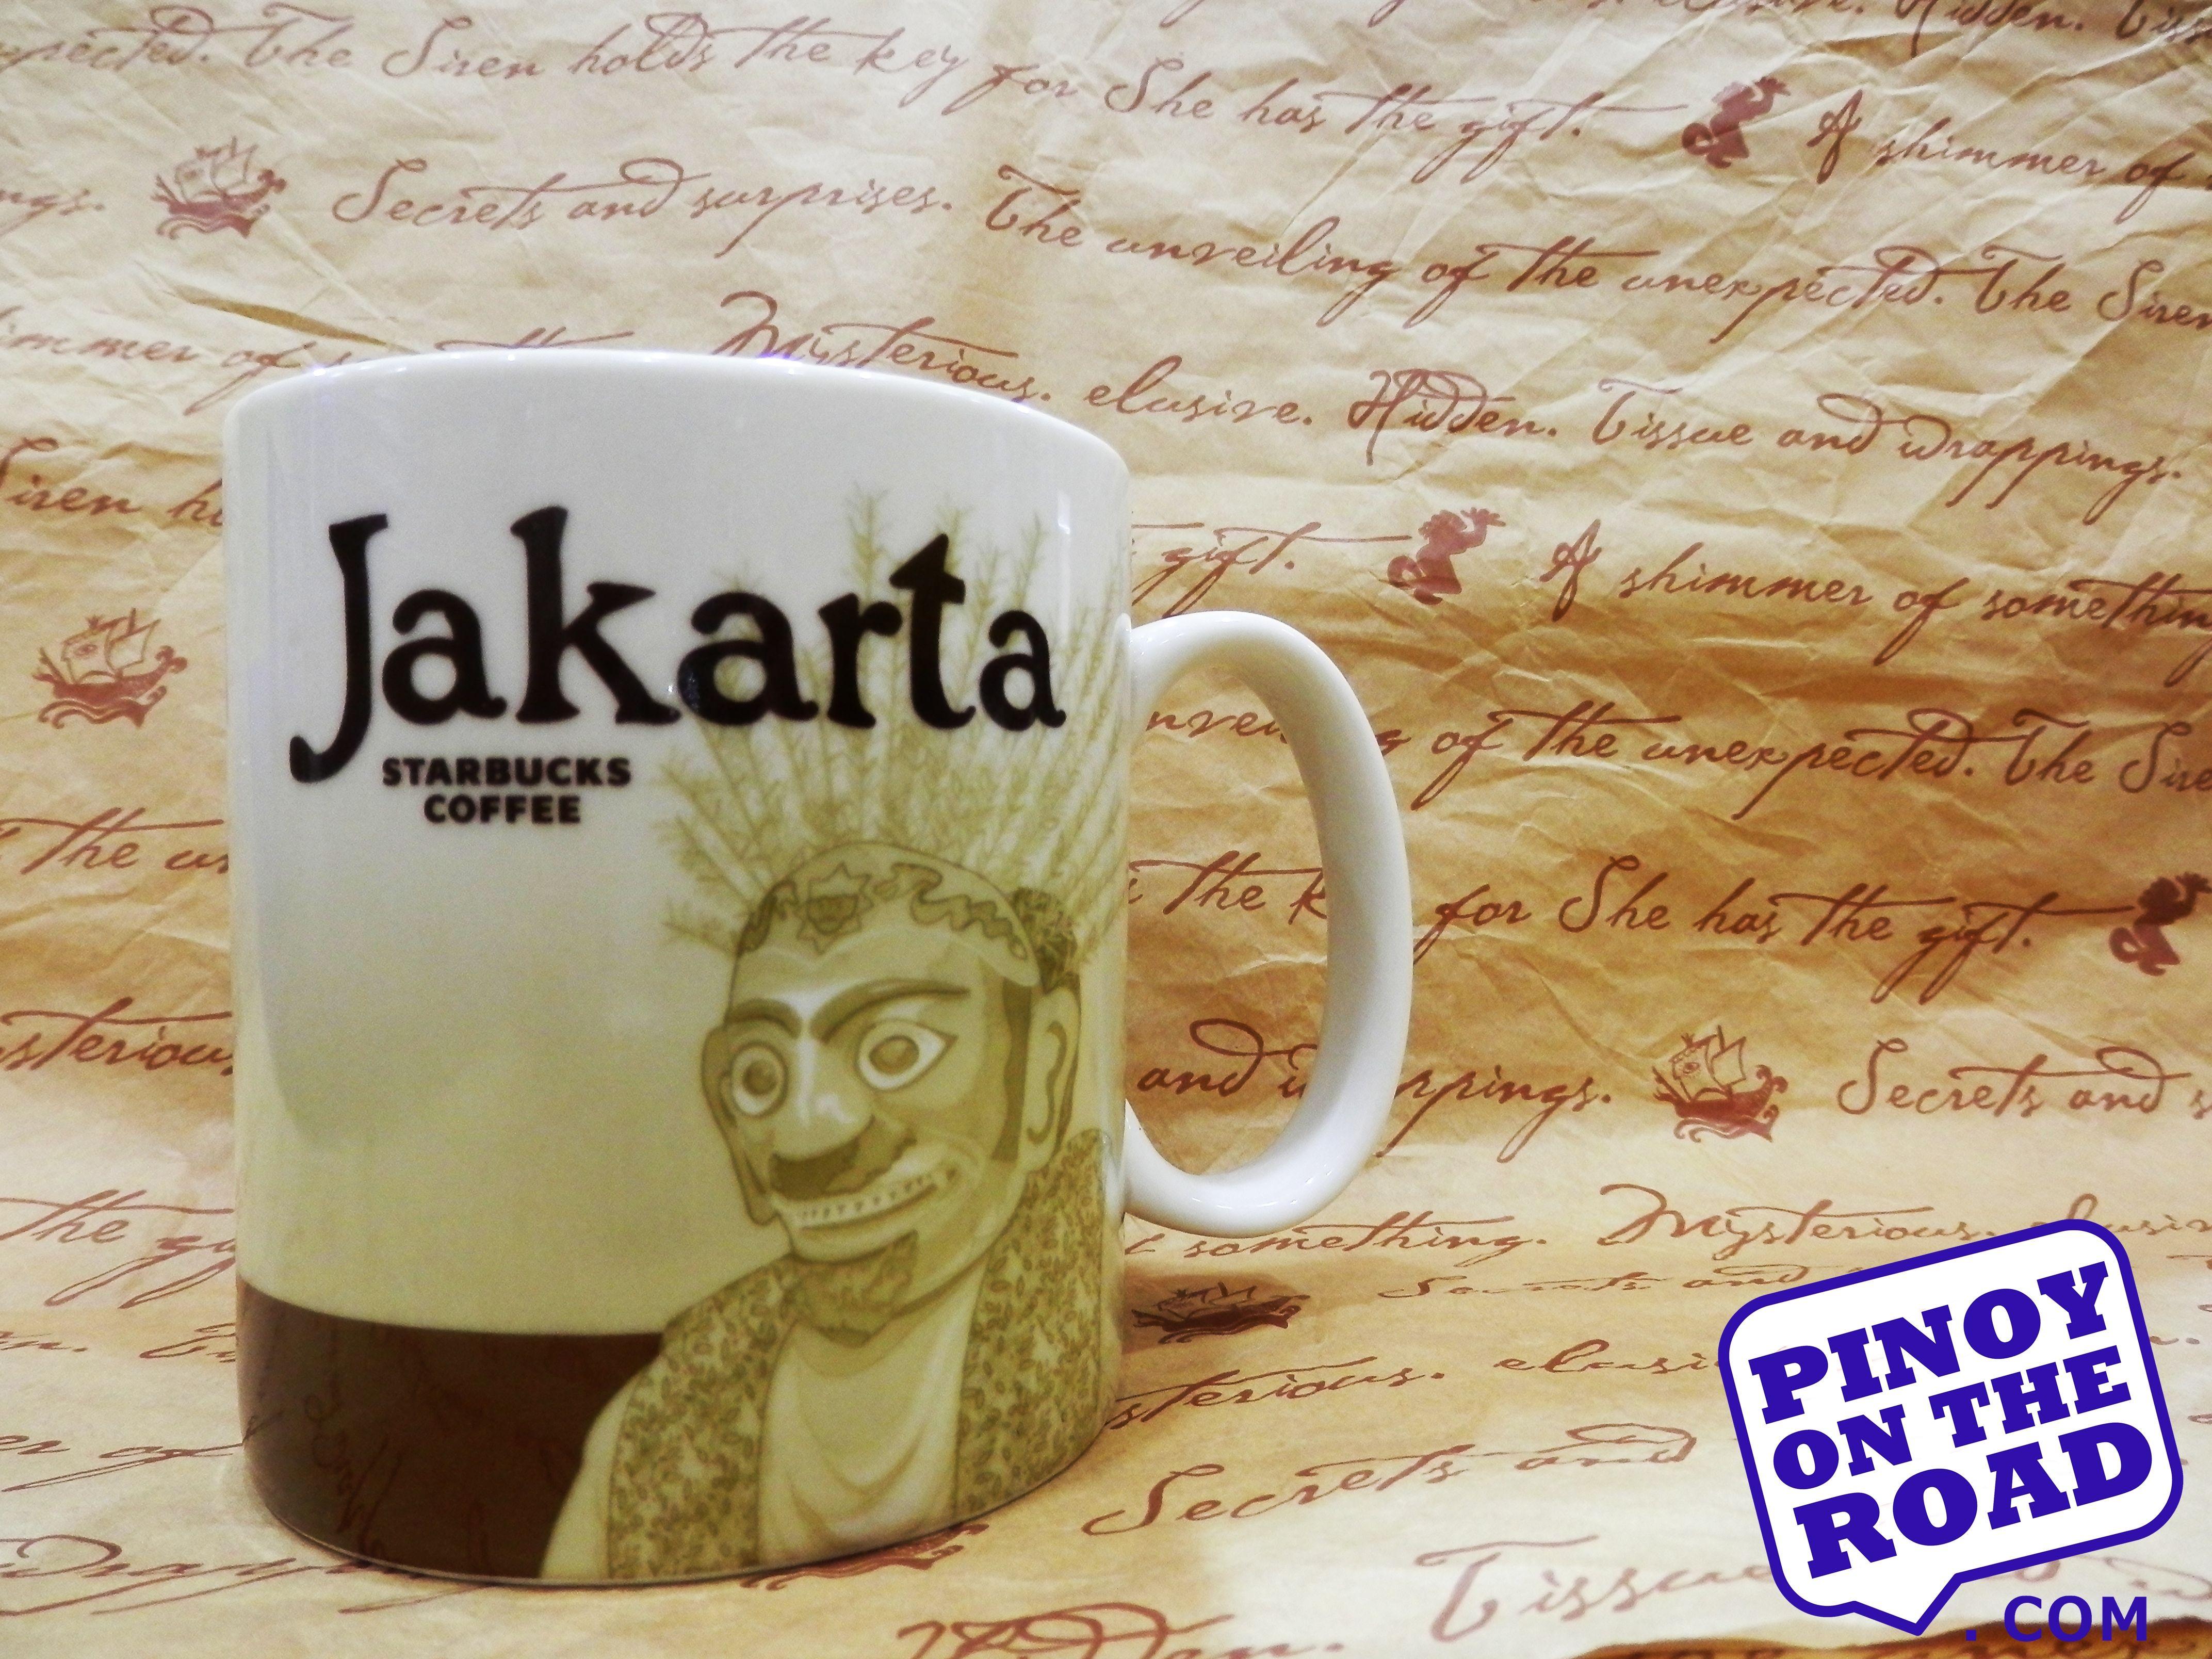 Starbucks Jakarta Icon Mug Starbucks, Mugs, Starbucks coffee